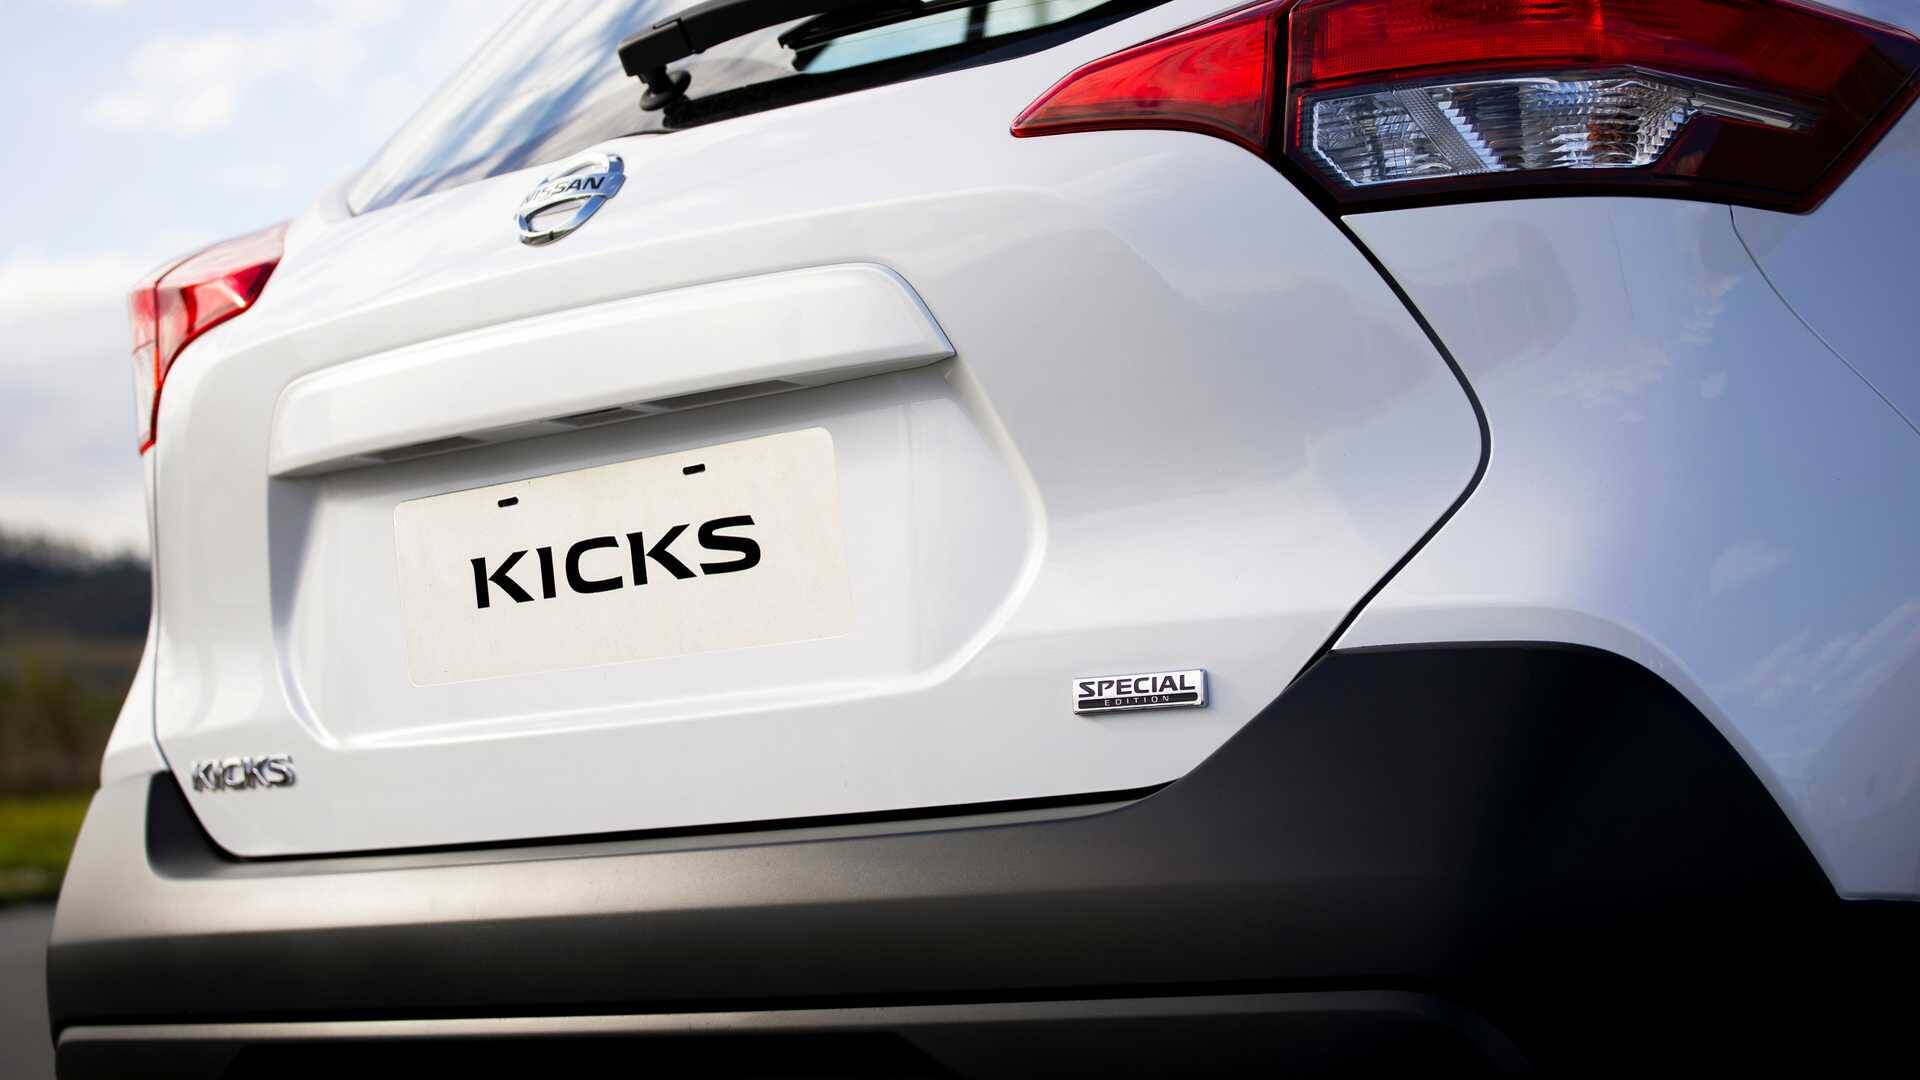 Nissan Kicks Special Edition. Foto: Divulgação